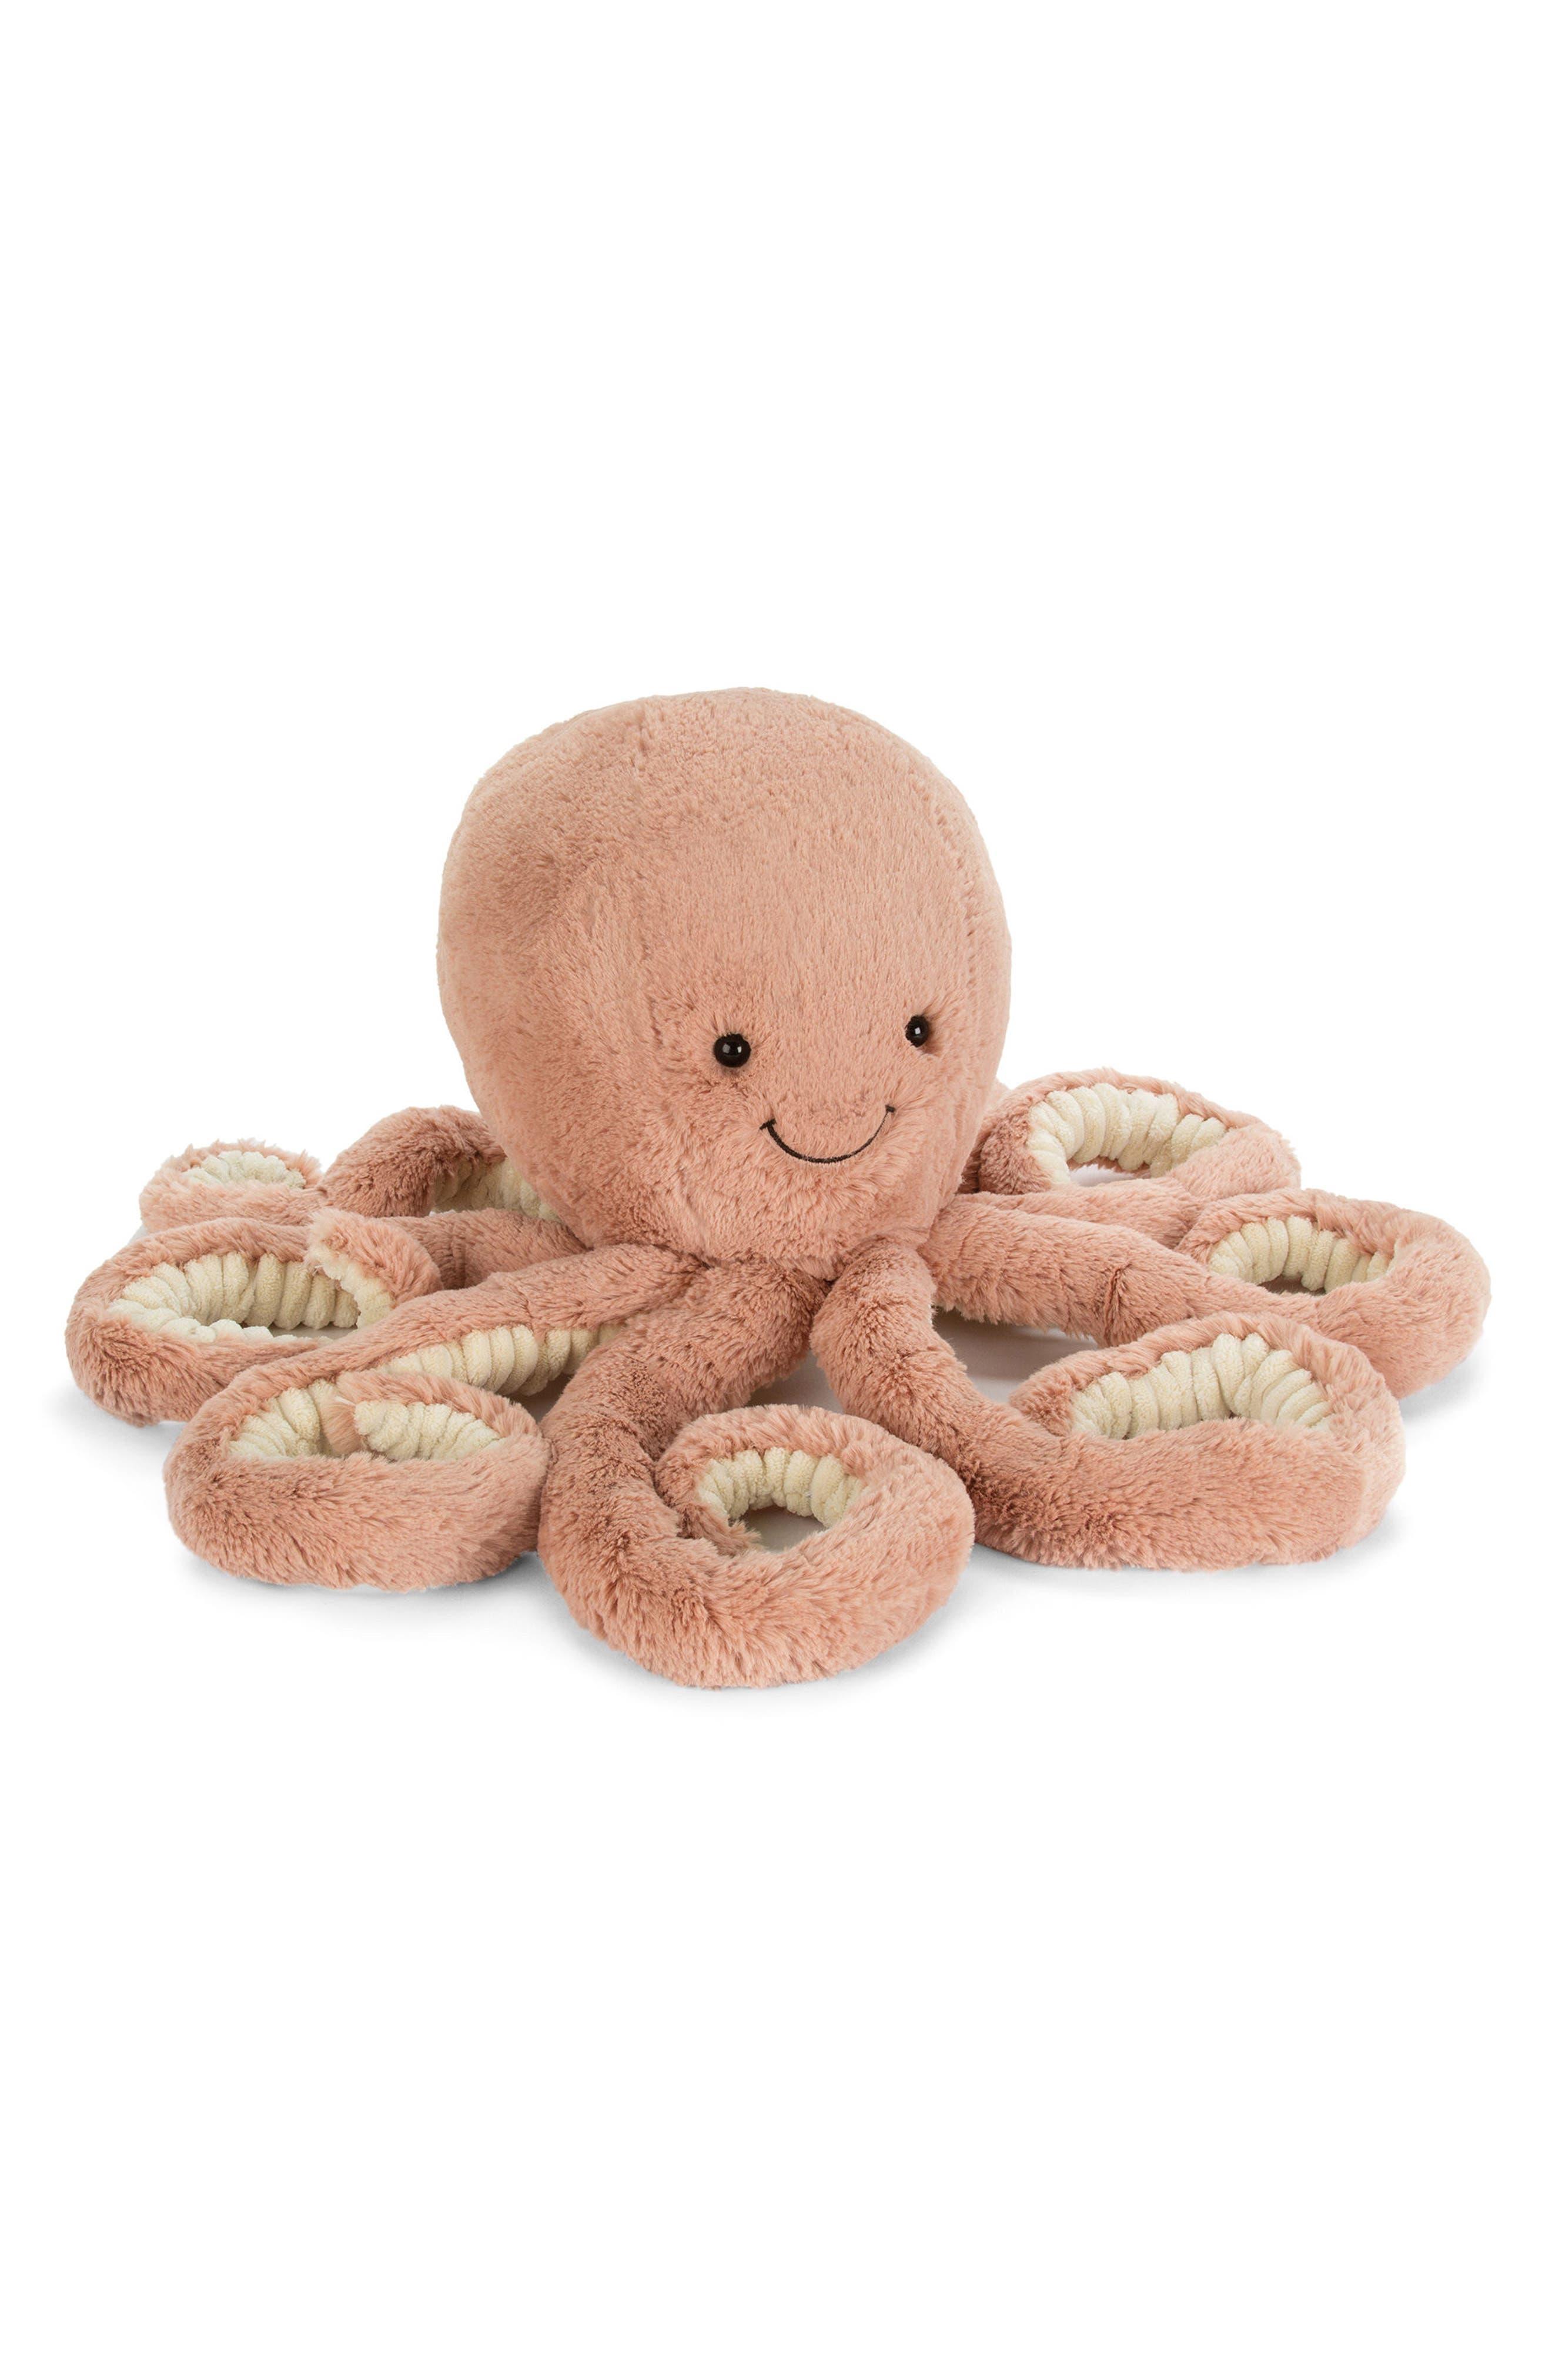 Jellycat Odell Octopus Stuffed Animal